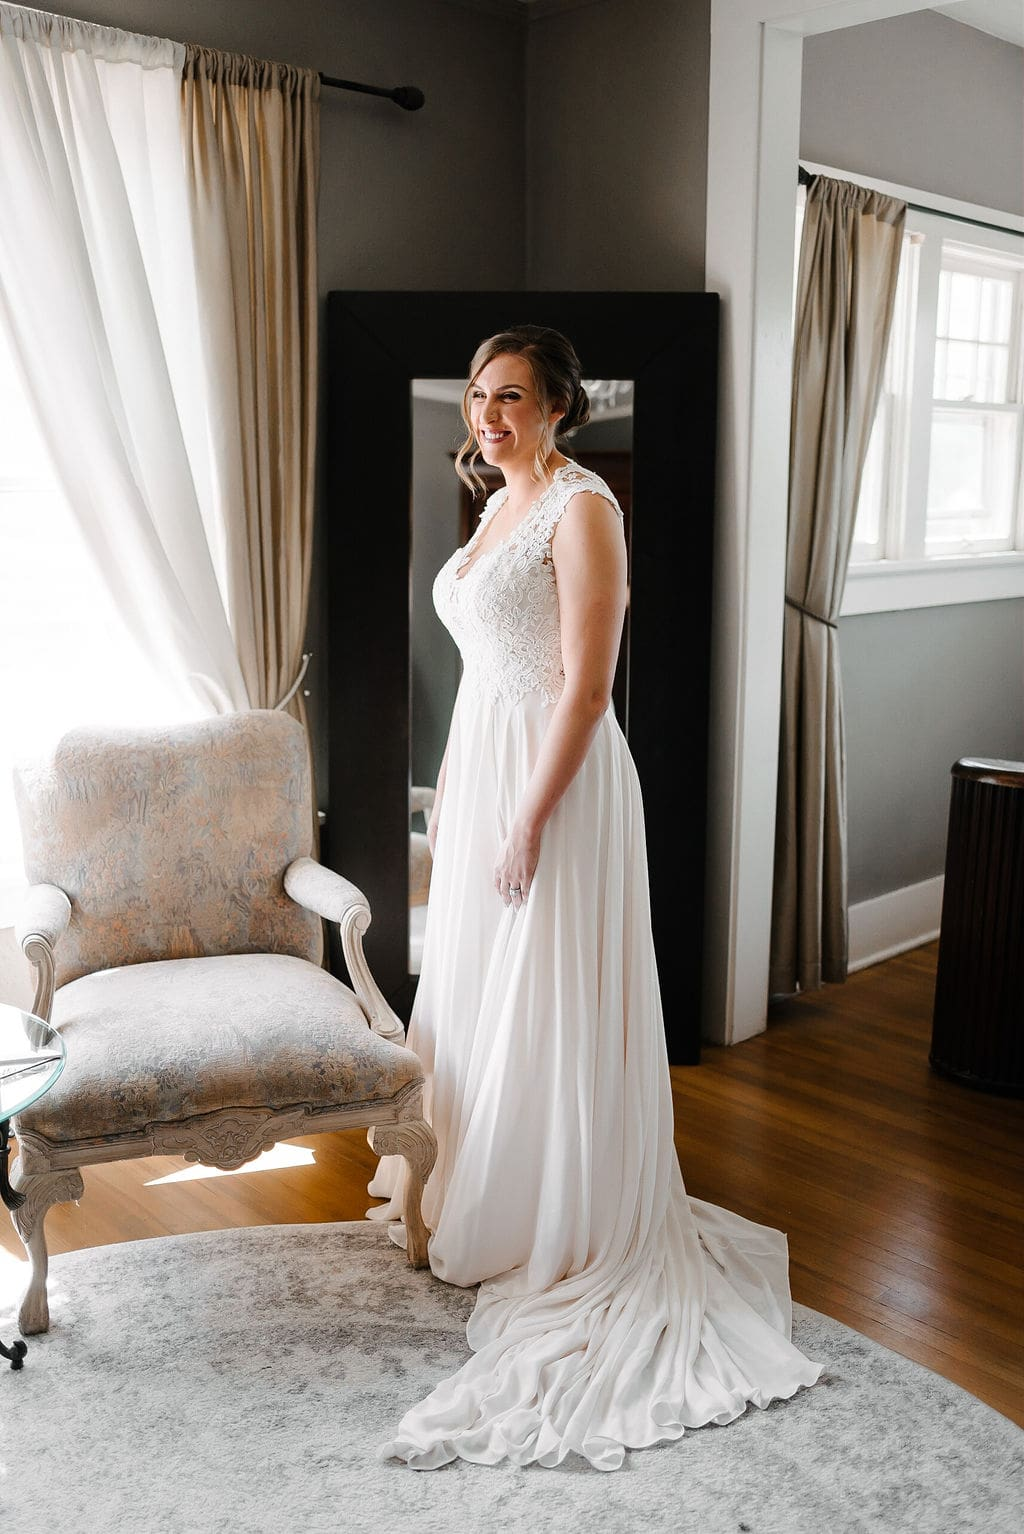 Classy Bride Portrait in Bridal Suite